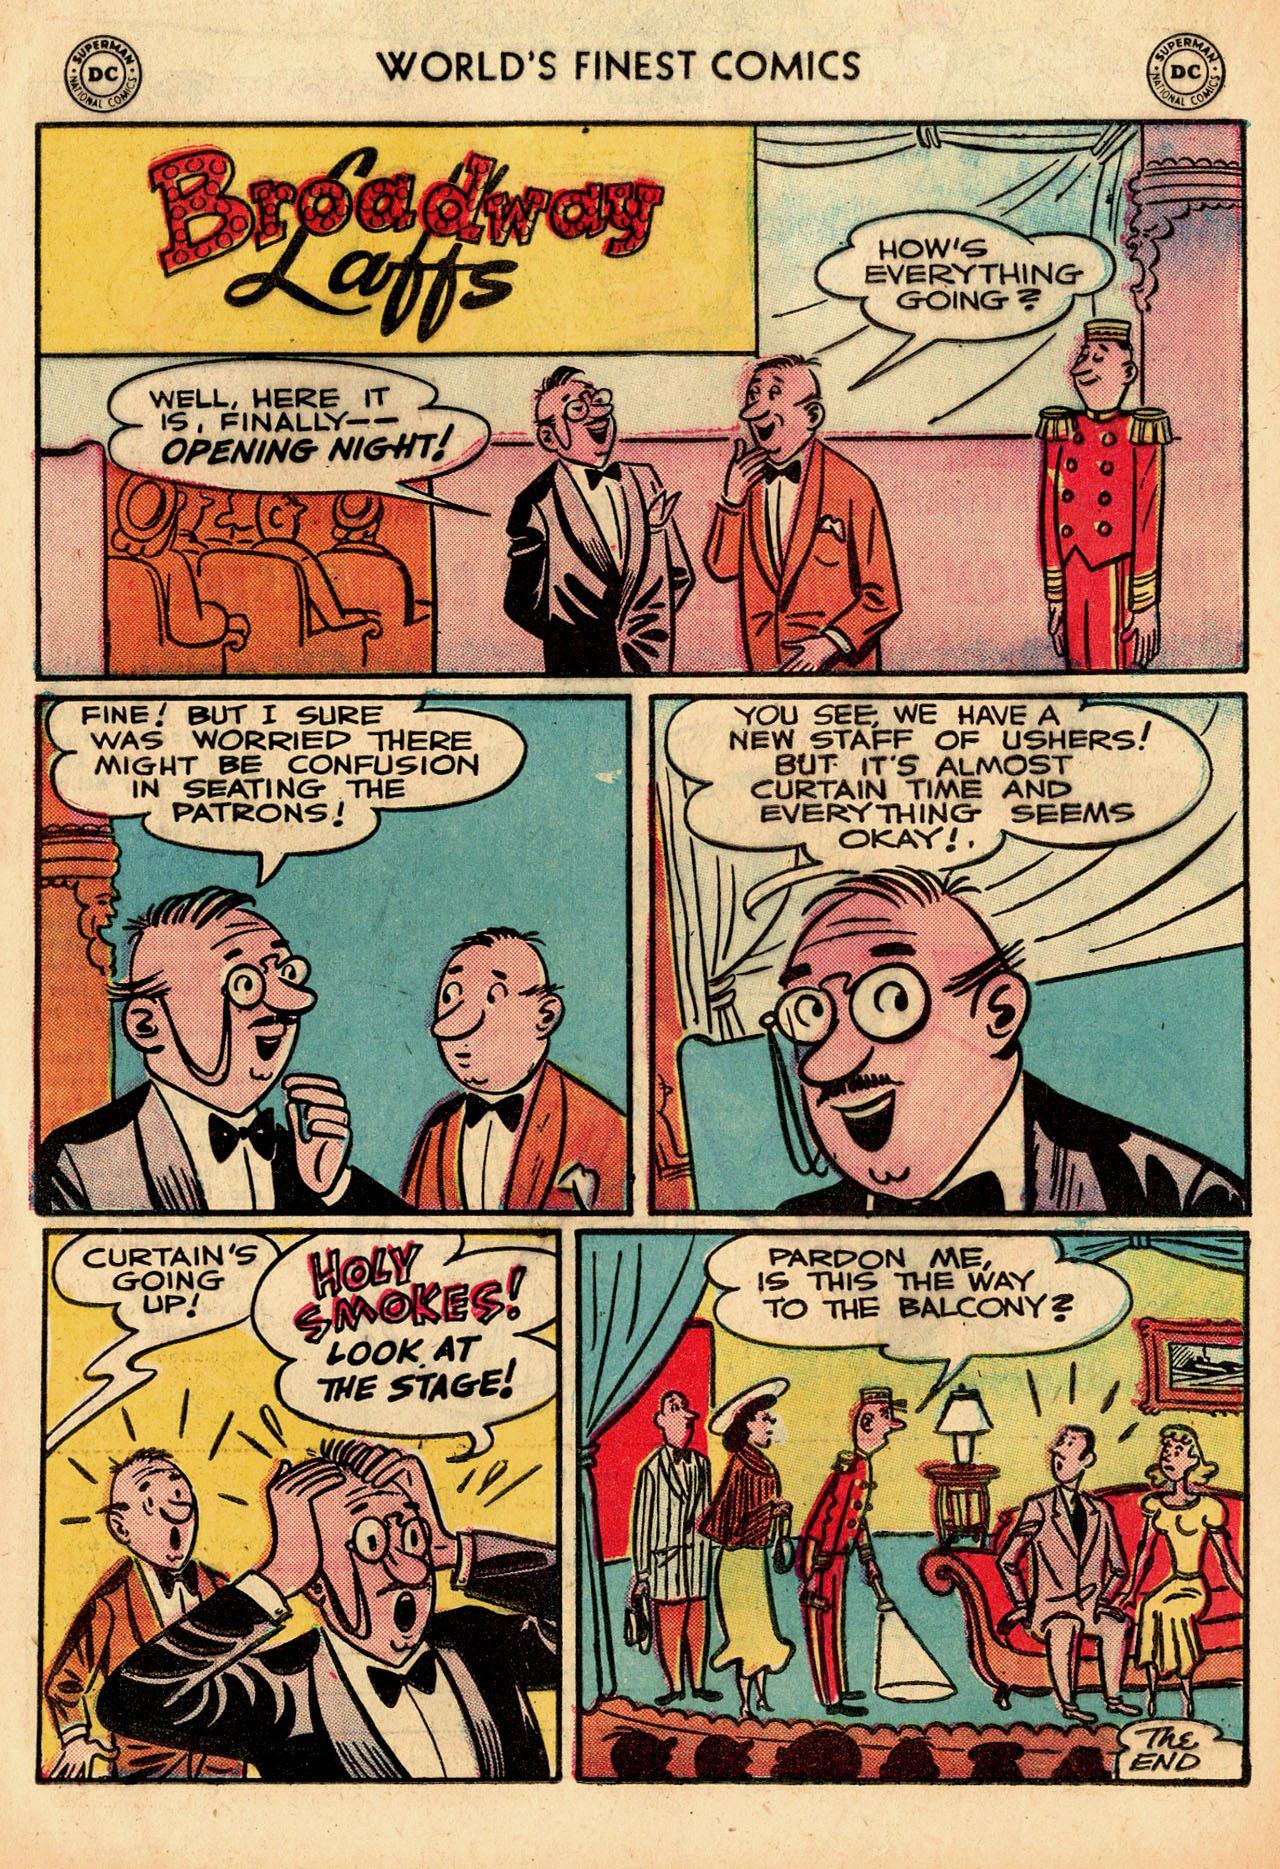 Read online World's Finest Comics comic -  Issue #91 - 16